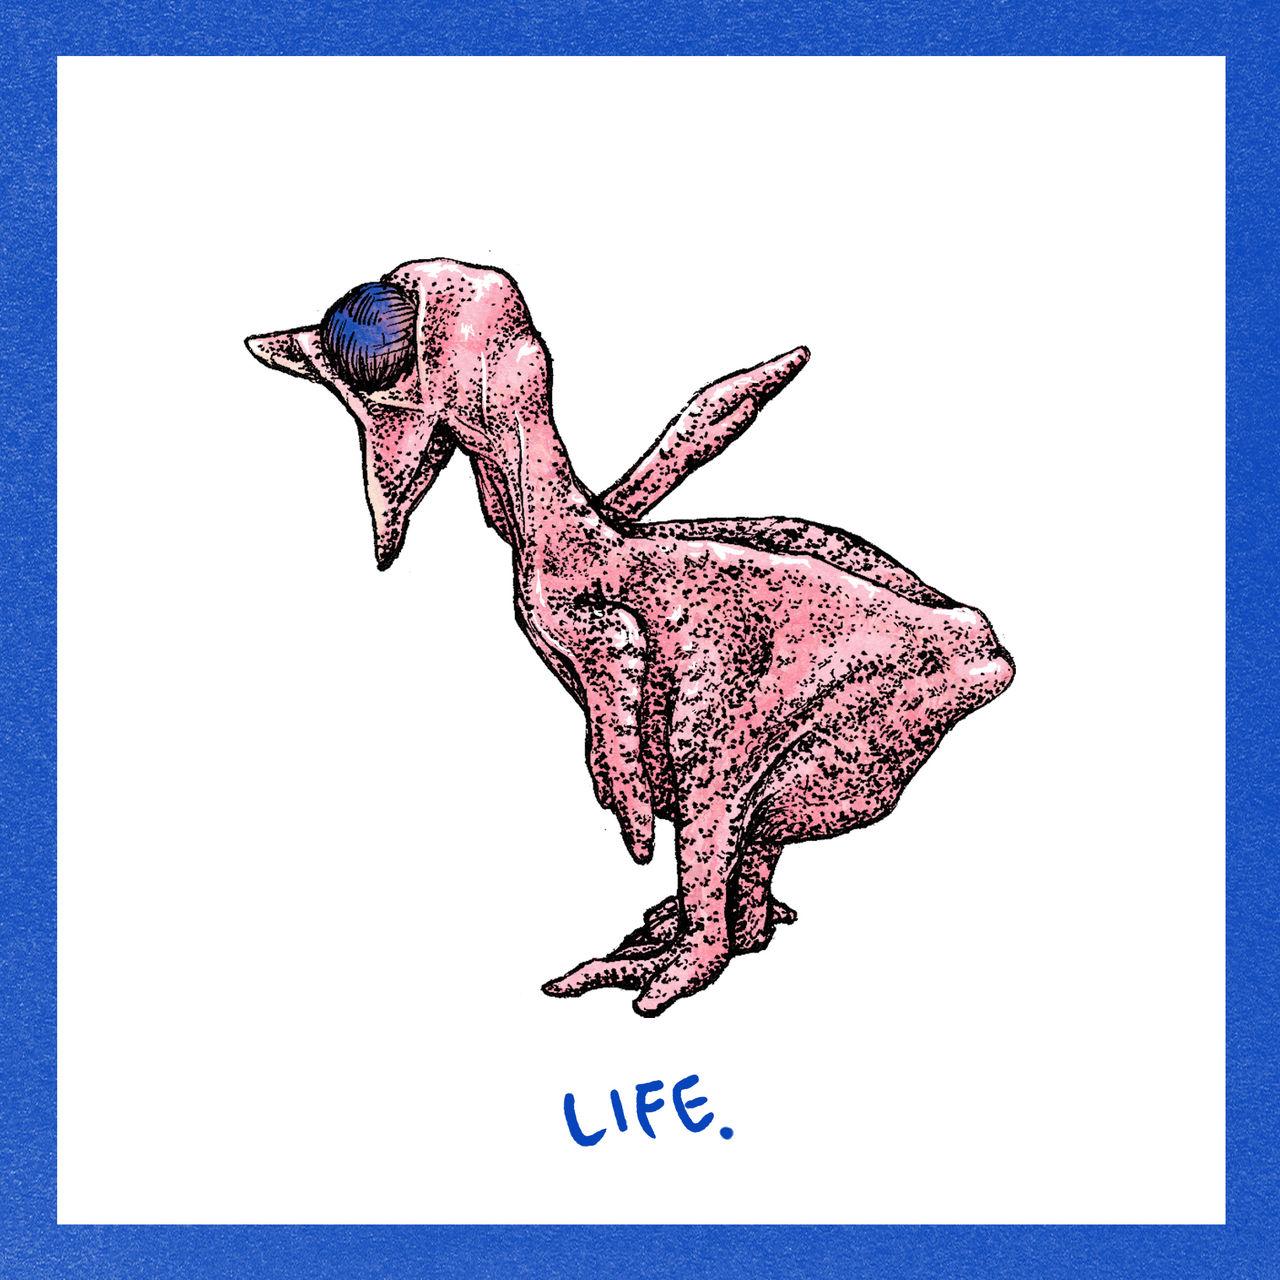 life, 2018